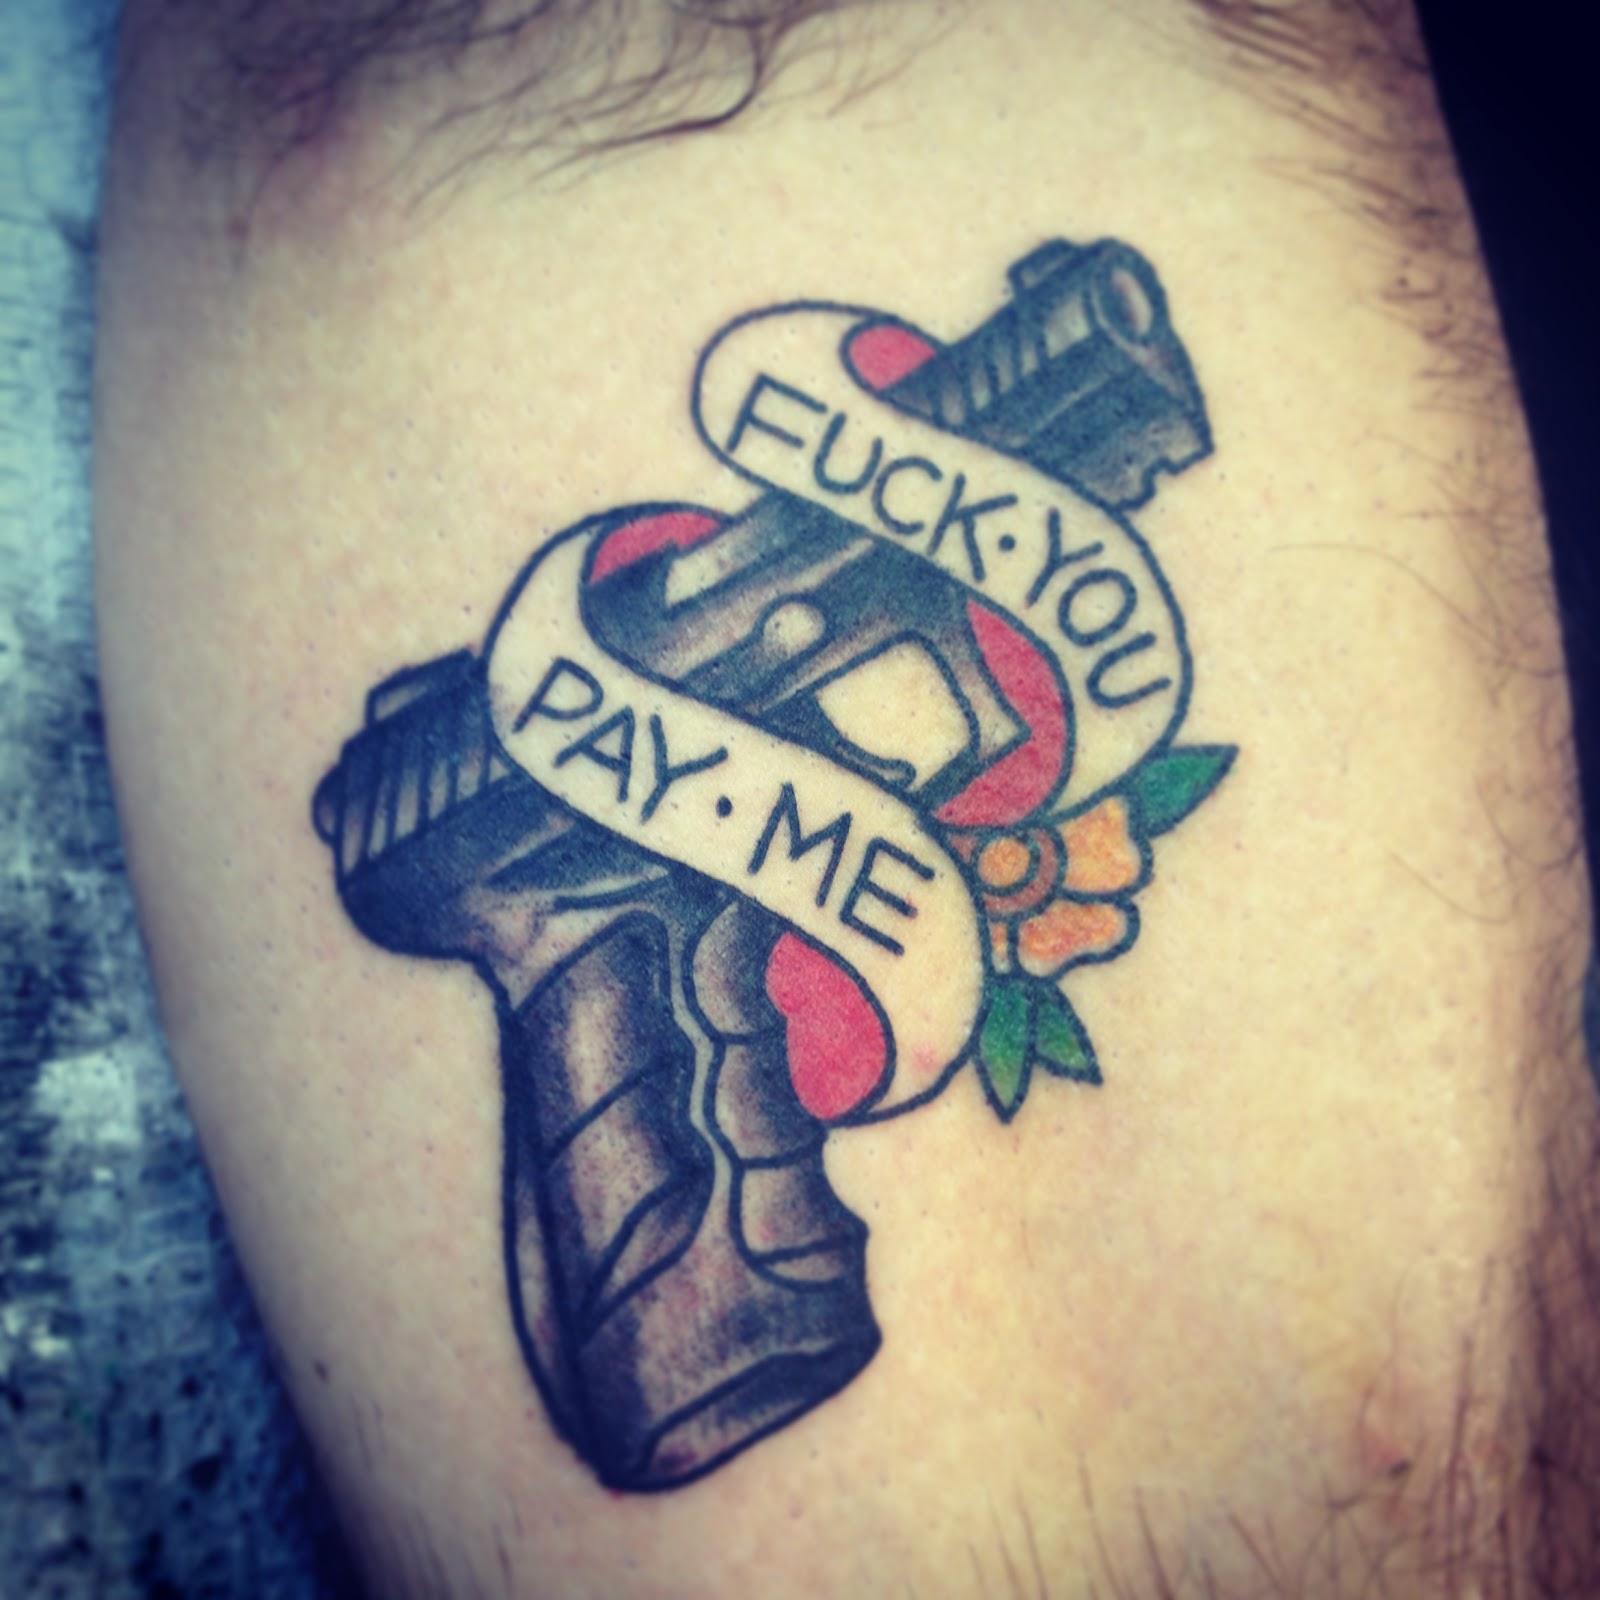 Fuck You Tattoo 20